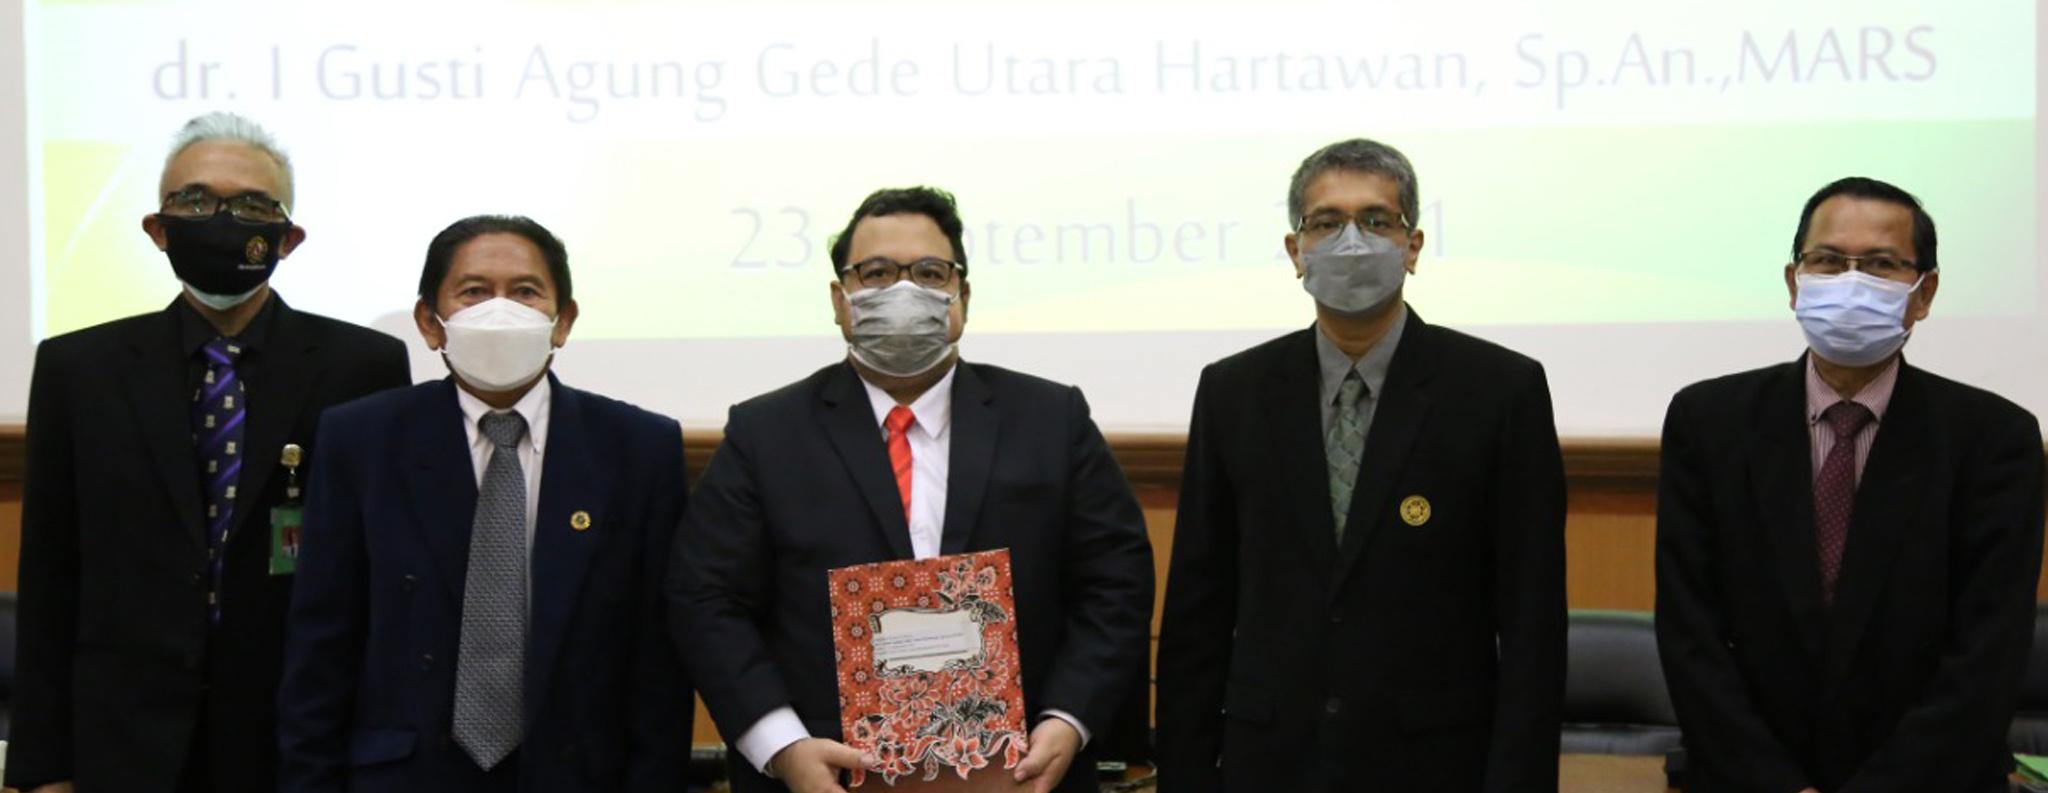 Ujian Daring Promosi Doktor dr. I Gusti Agung Gede Utara Hartawan, Sp.An.,MARS